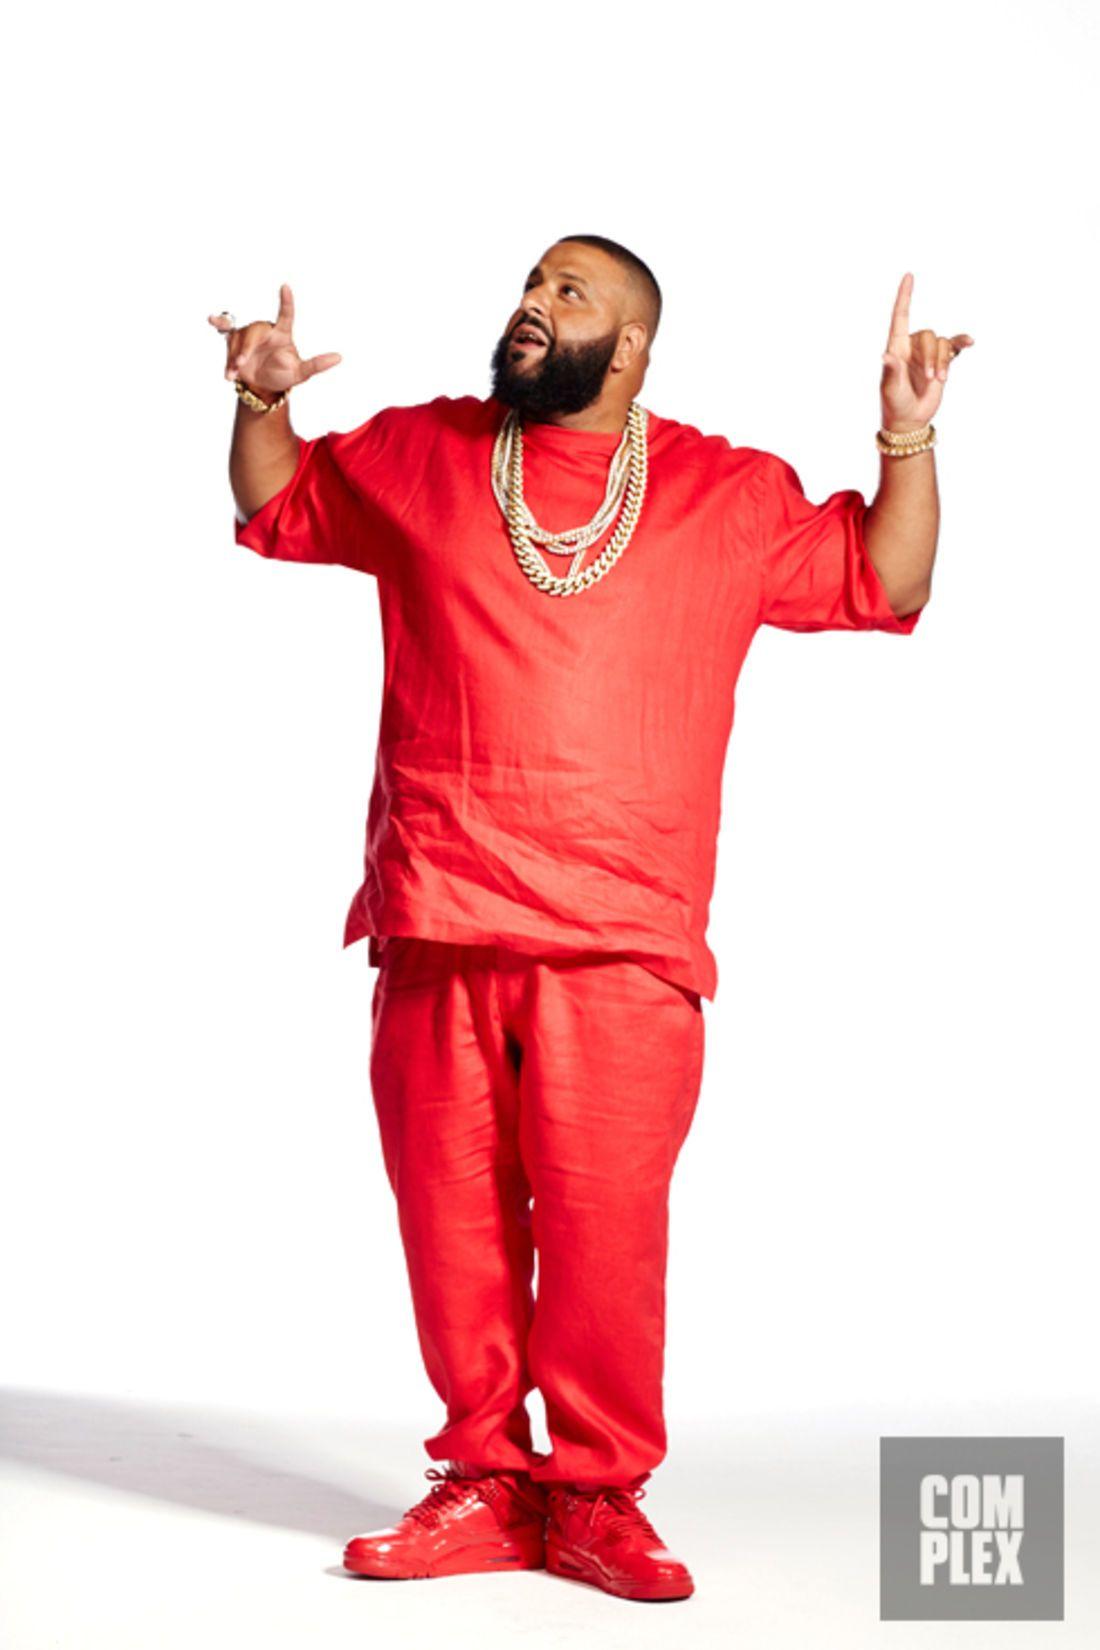 The Greatest Show On Earth How Dj Khaled Became Hip Hop S Biggest Personality Dj Khaled Dj Dj Khaled Keys